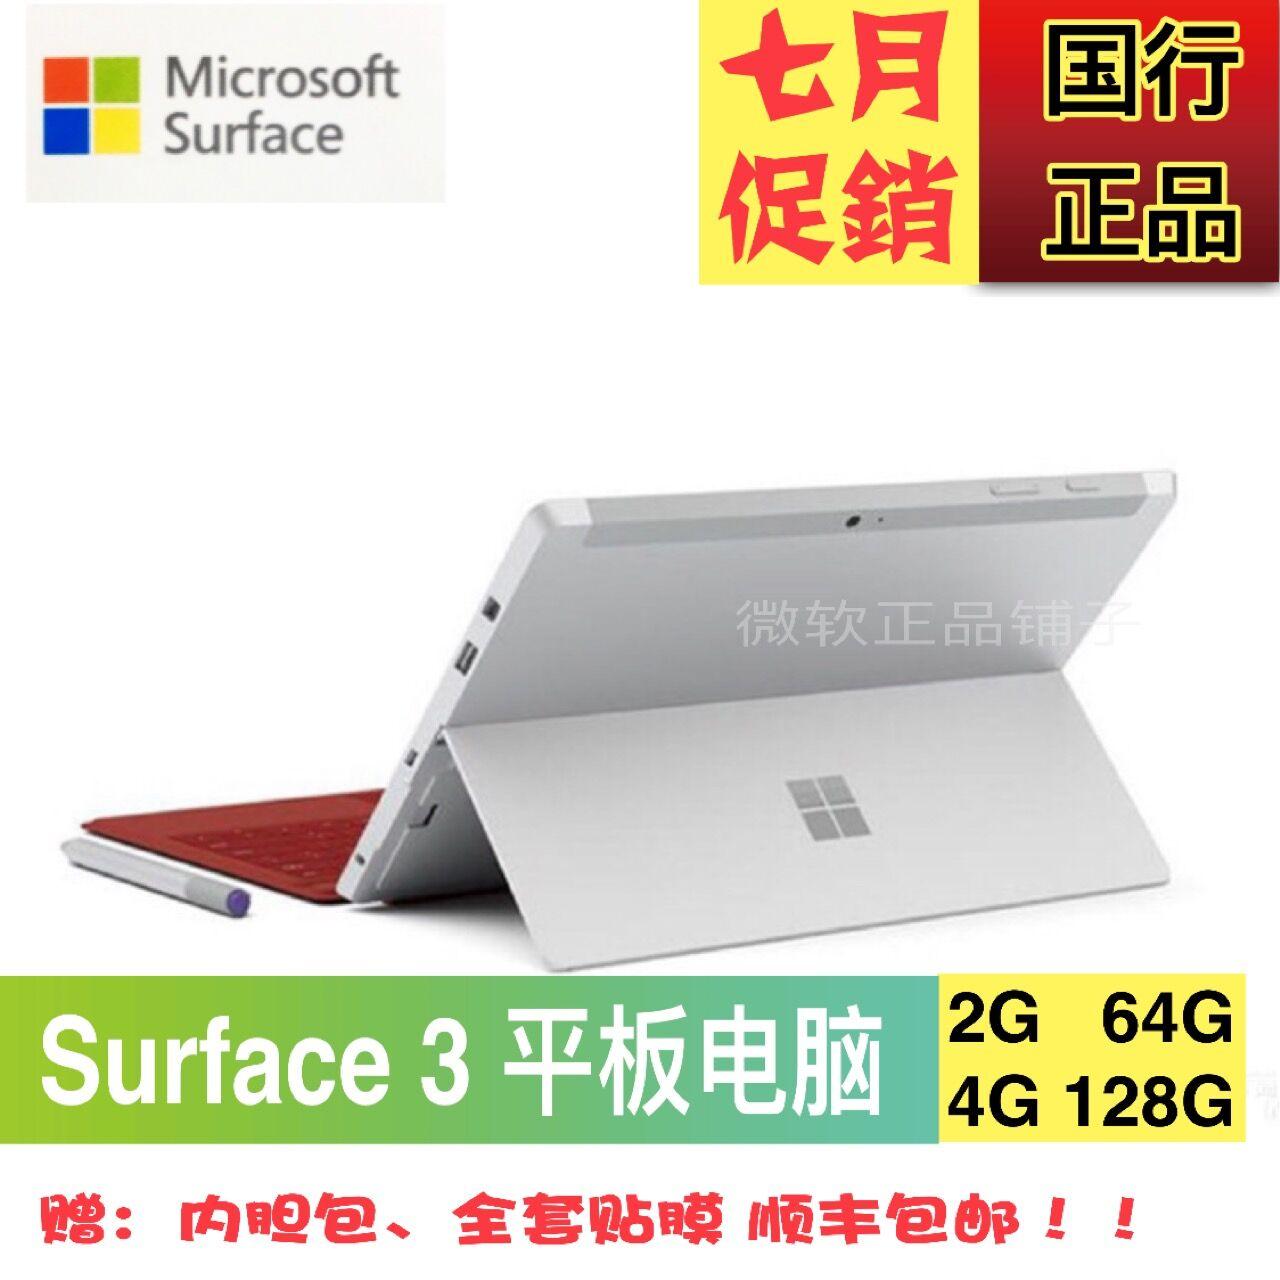 Microsoft/微软 SURFACE 3 64GB 128G 10.8寸 WIFI 平板电脑国行